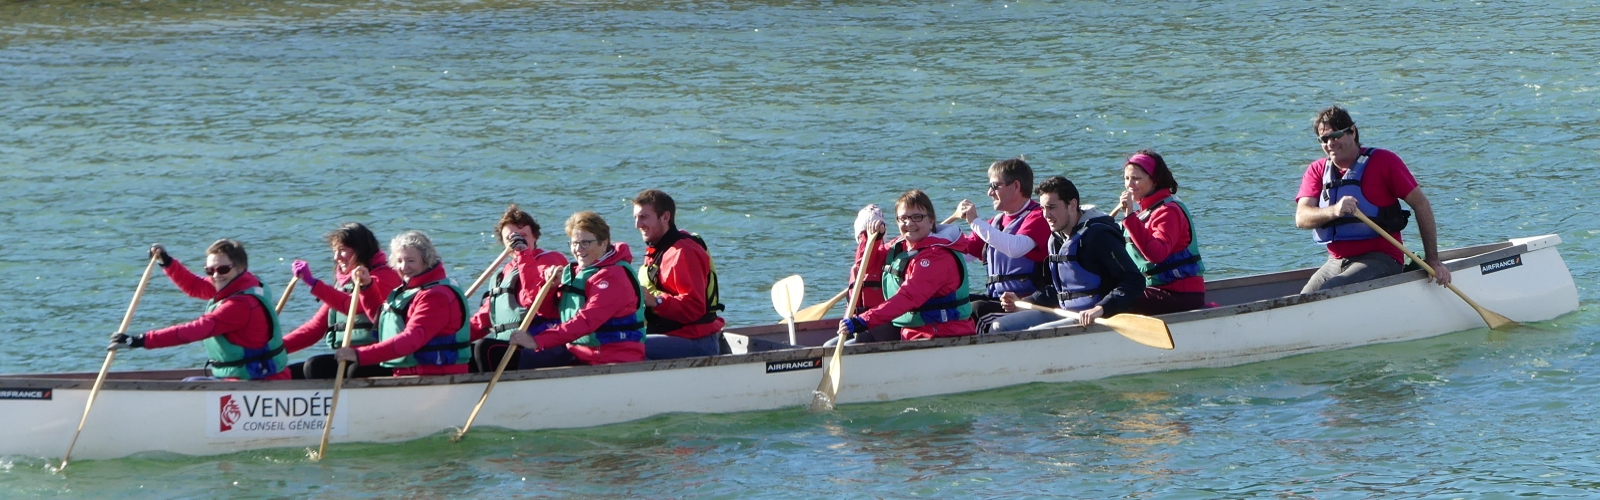 canoe 15 places vendee